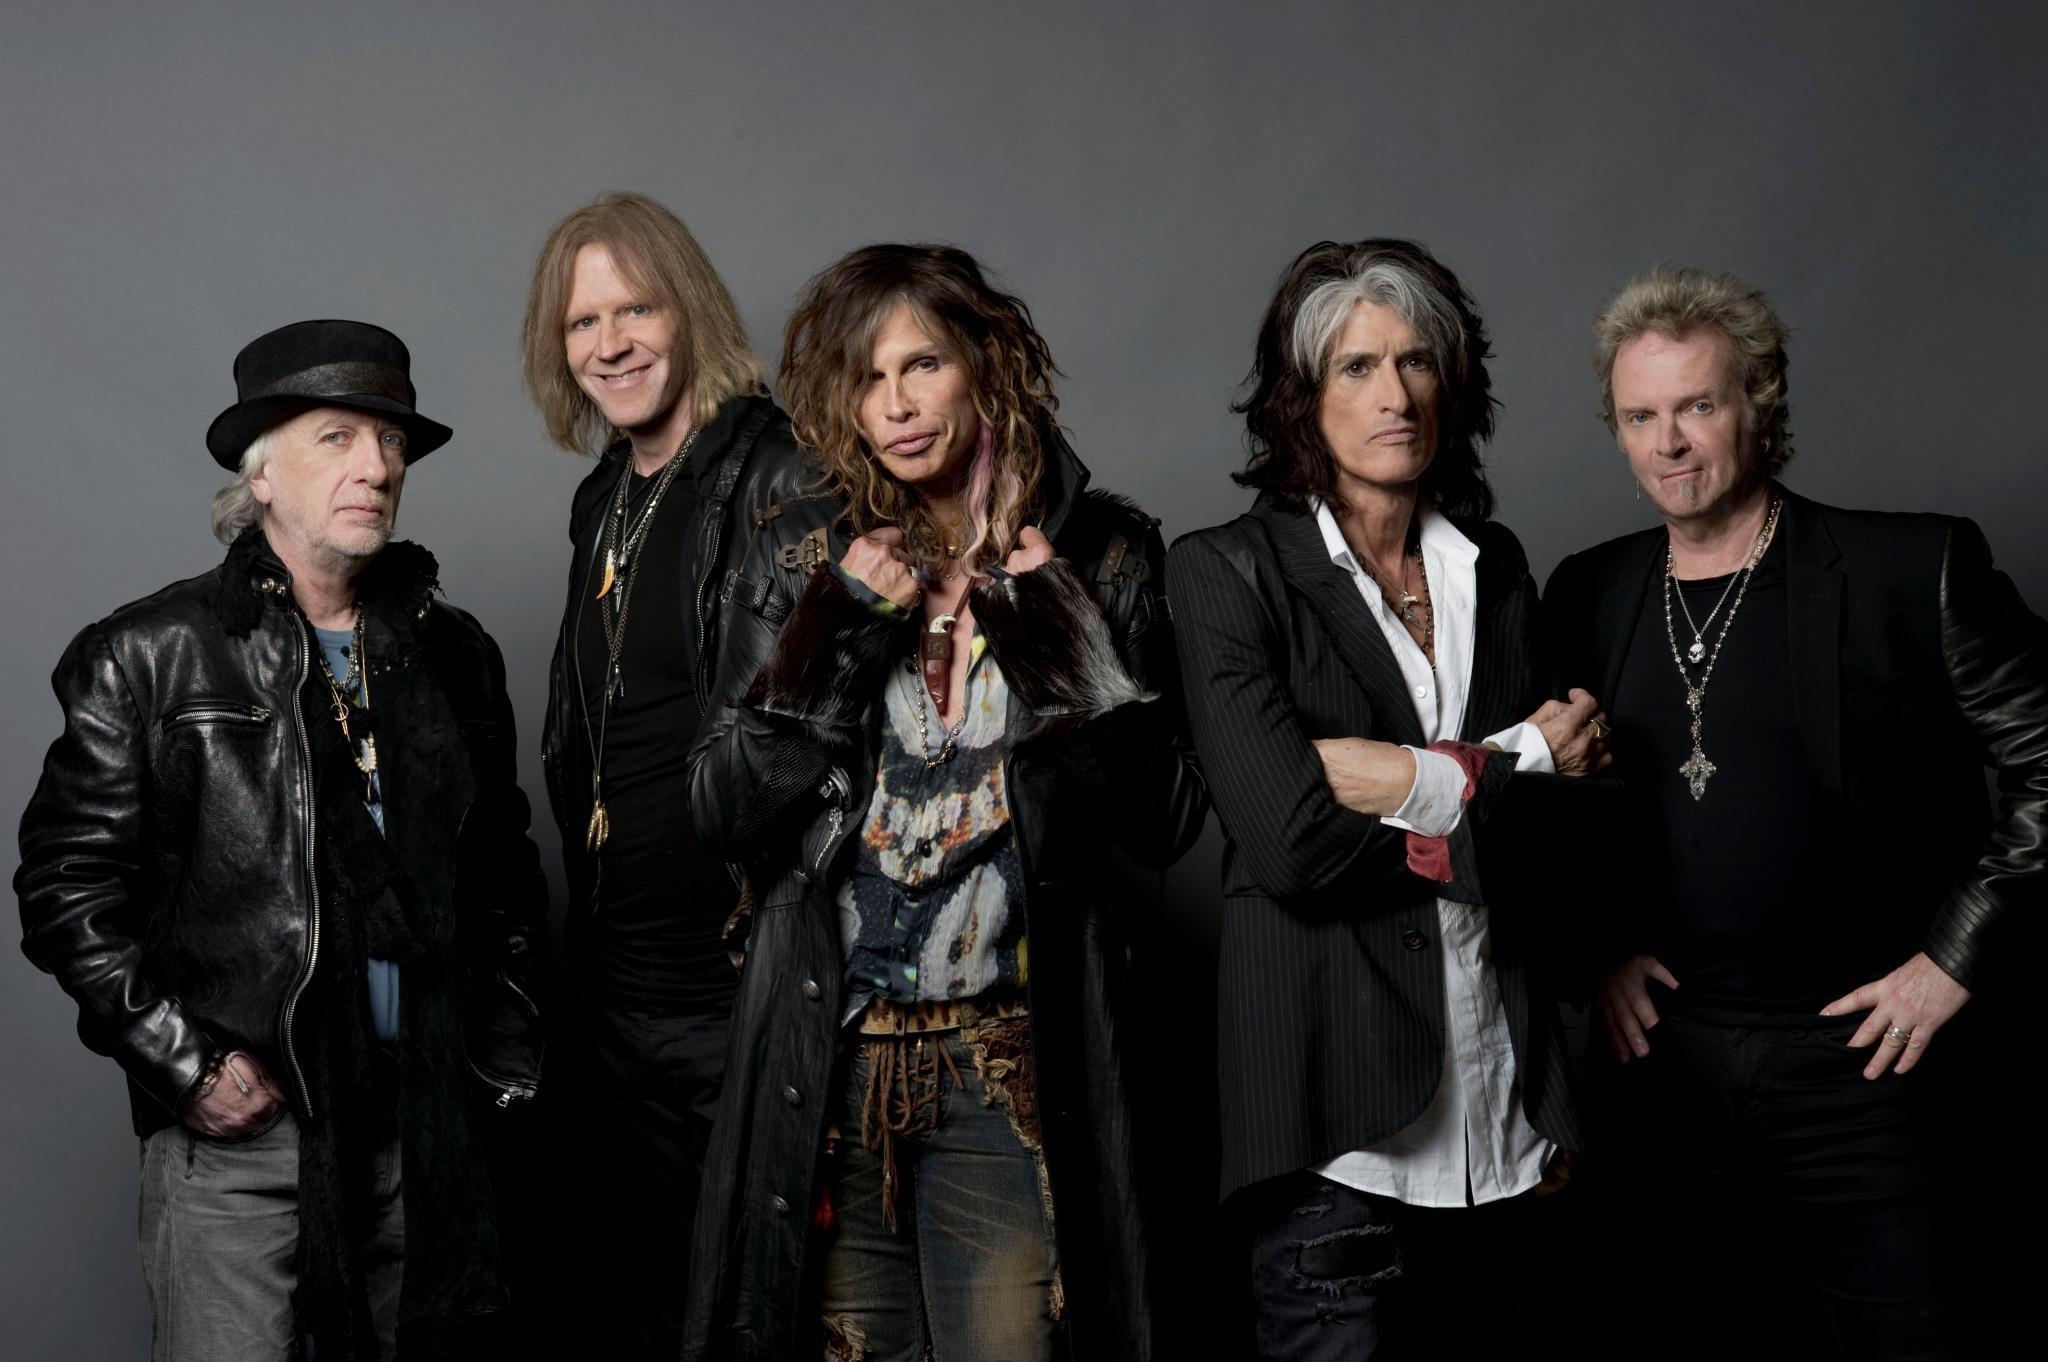 Steven Tyler do Aerosmith surpreende fã na rua - Na Balada